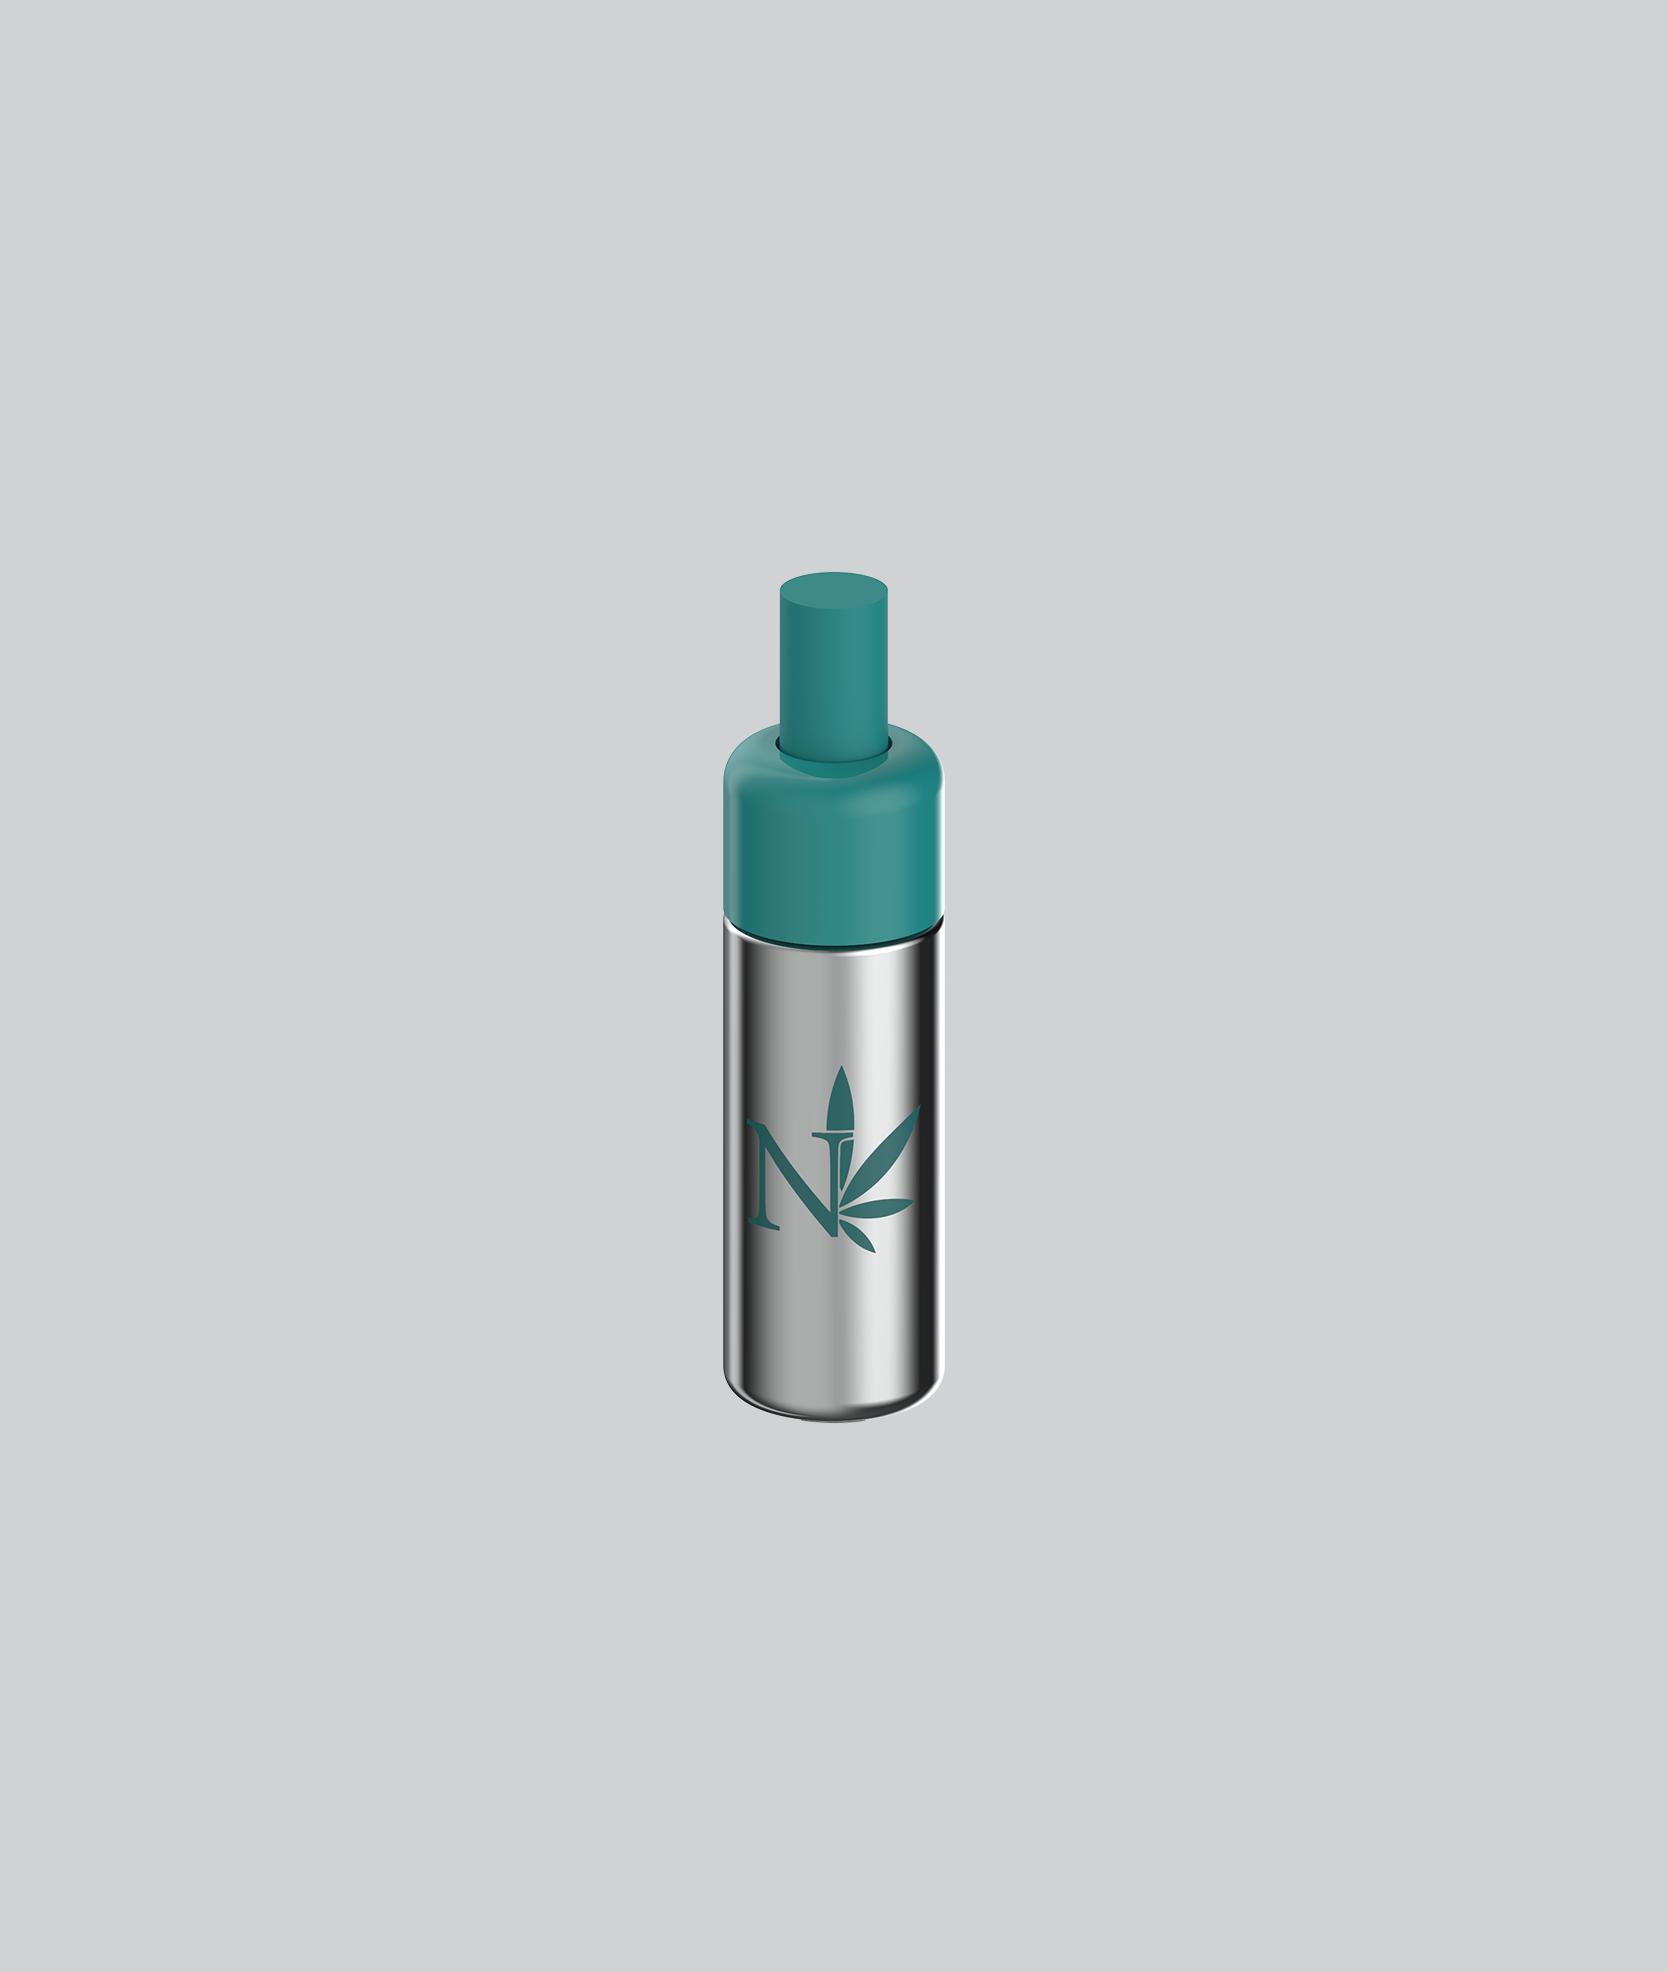 nleaf-custom-15-30-ml-dropper